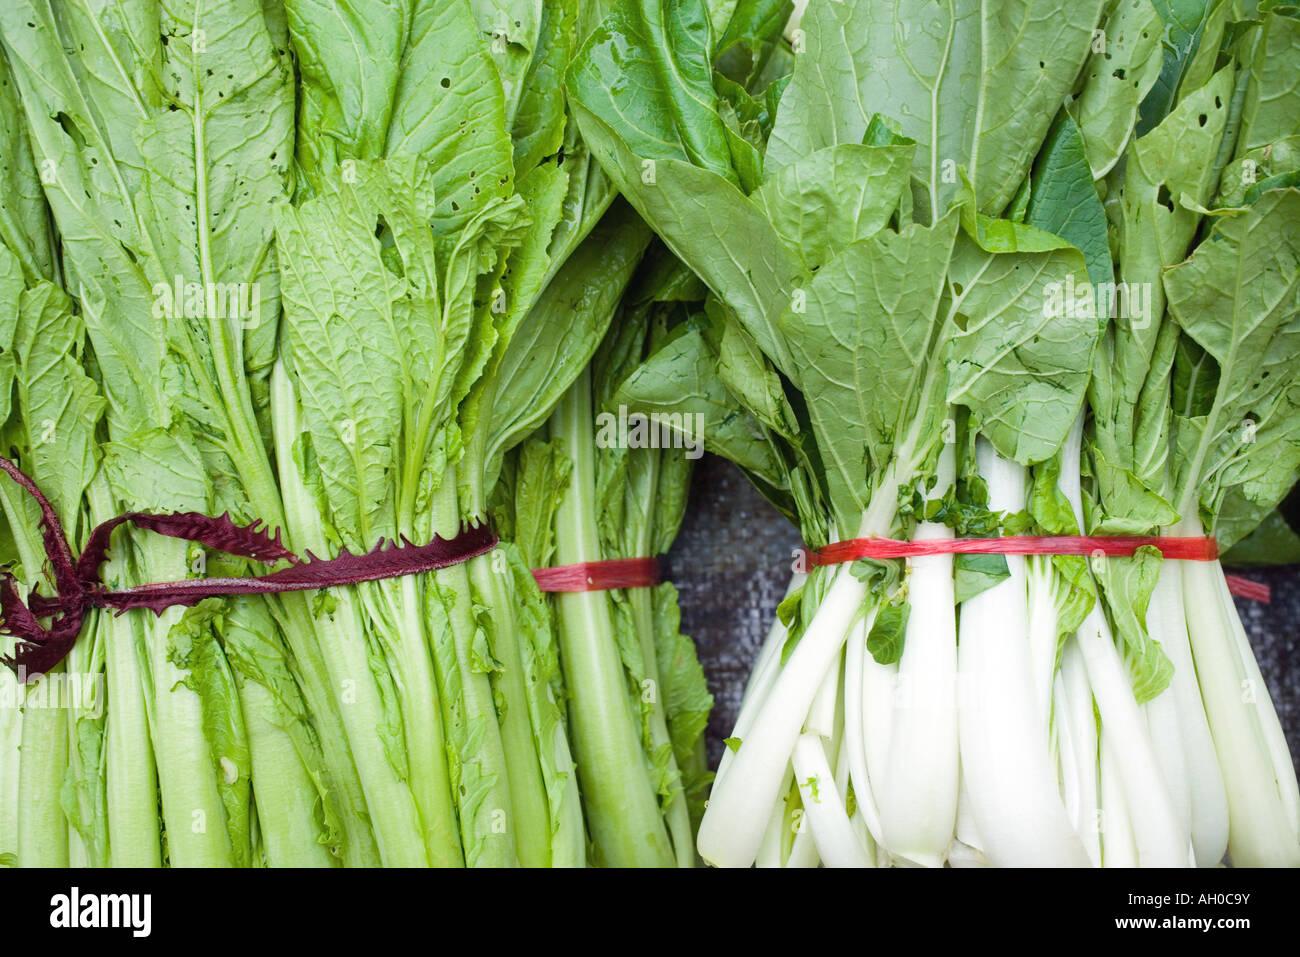 Bundles of mustard greens and bok choy - Stock Image